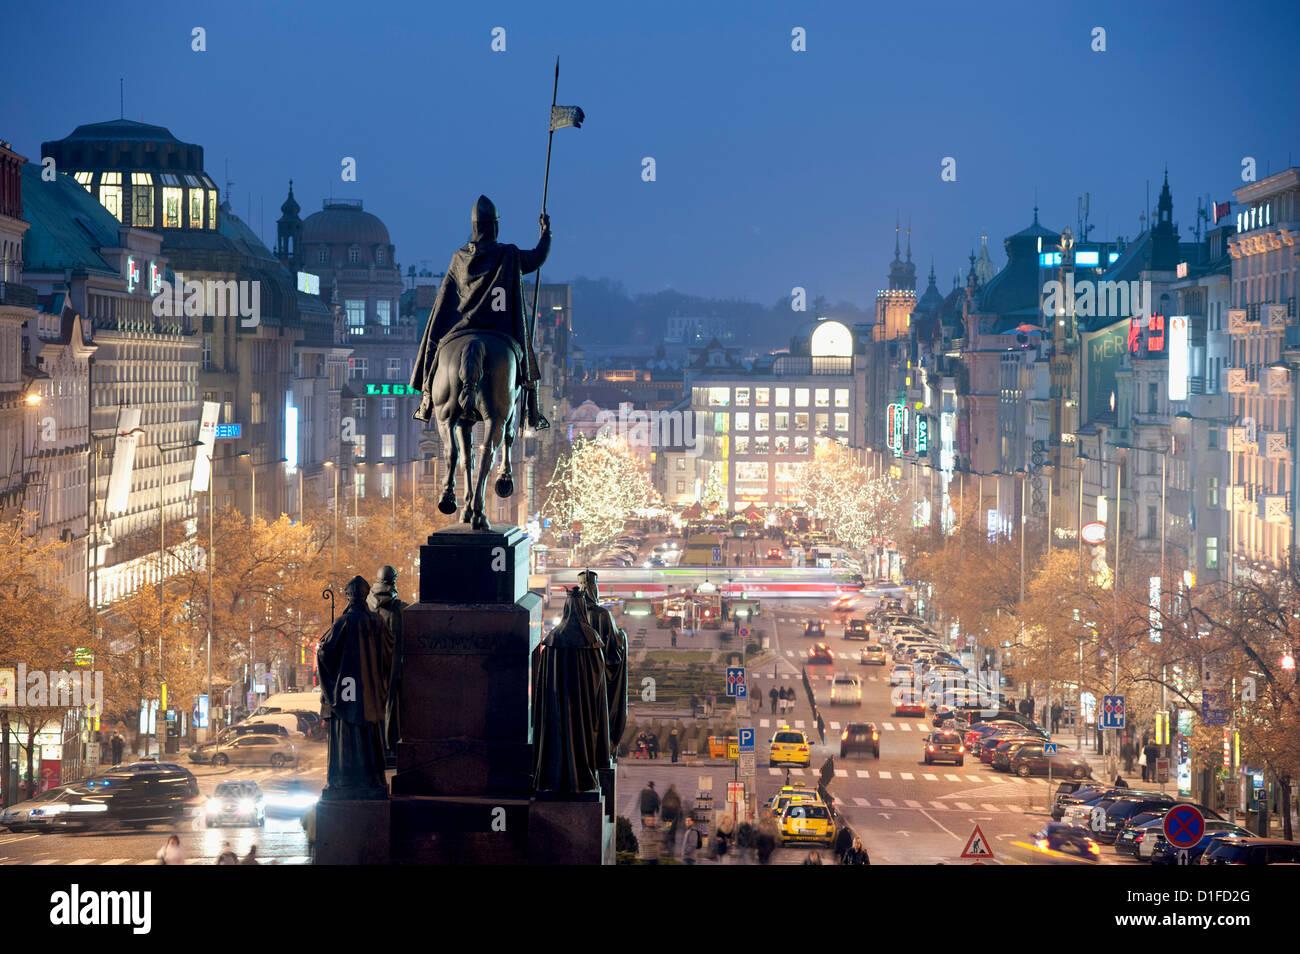 Statue of St. Wenceslas and Wenceslas Square at twilight, Nove Mesto, Prague, Czech Republic, Europe - Stock Image